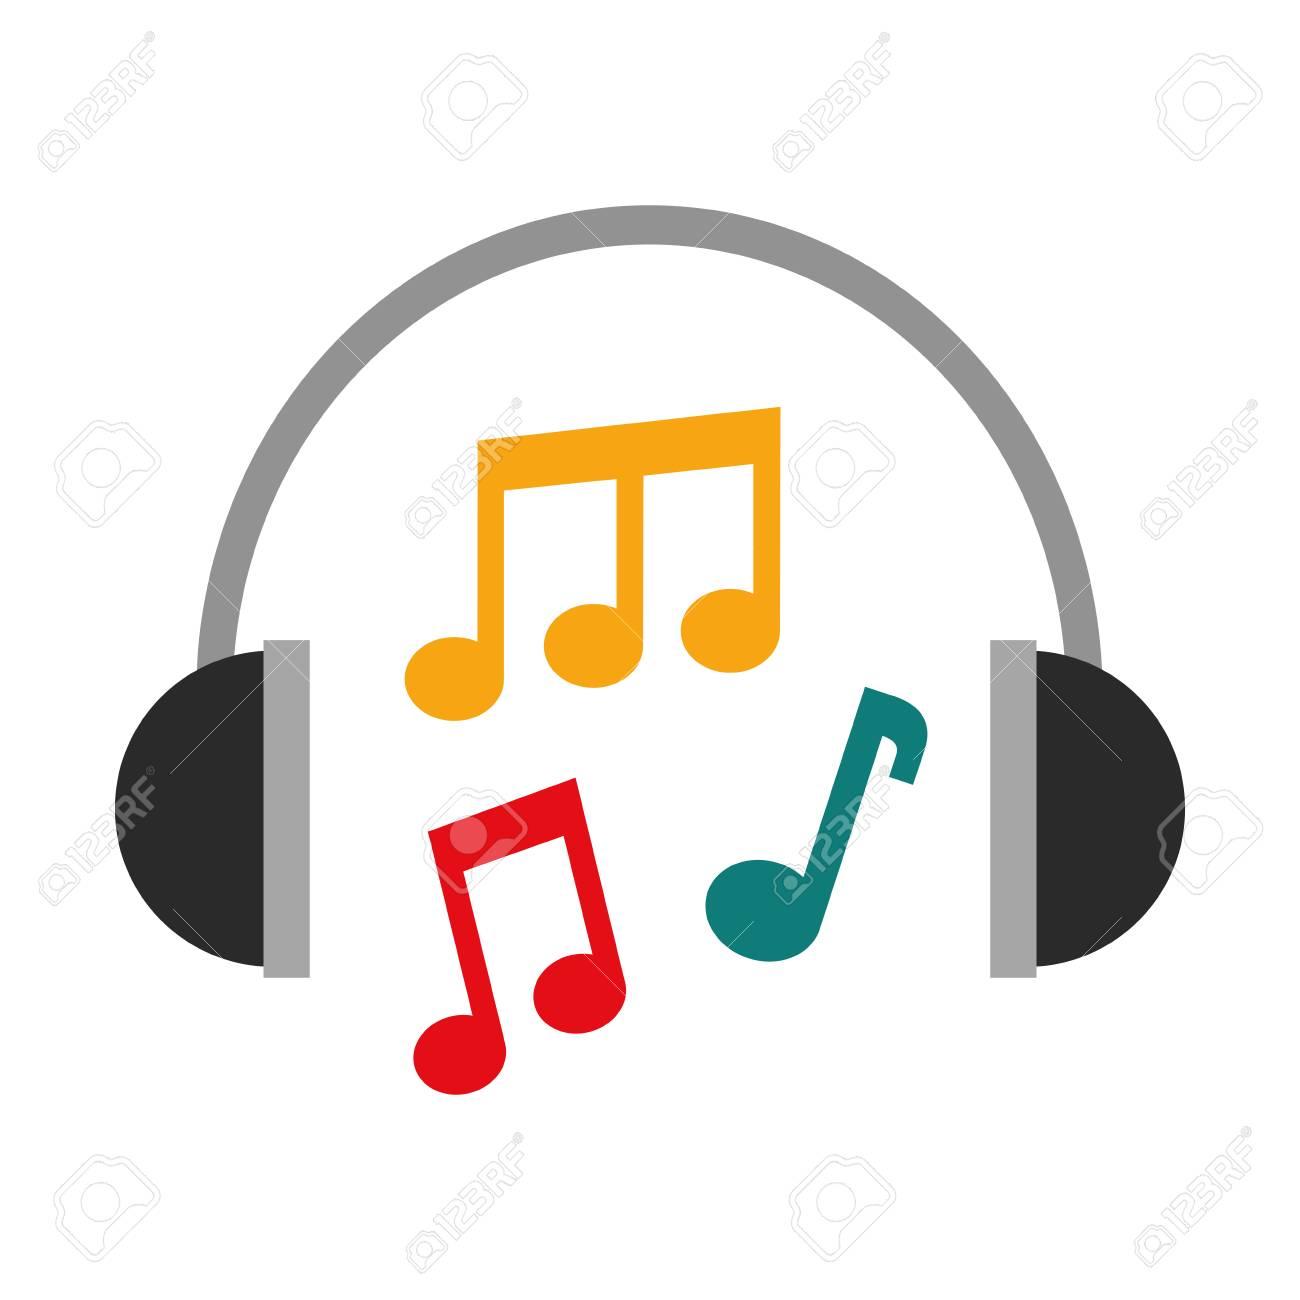 headphones note music sound harmony vector illustration - 90294524